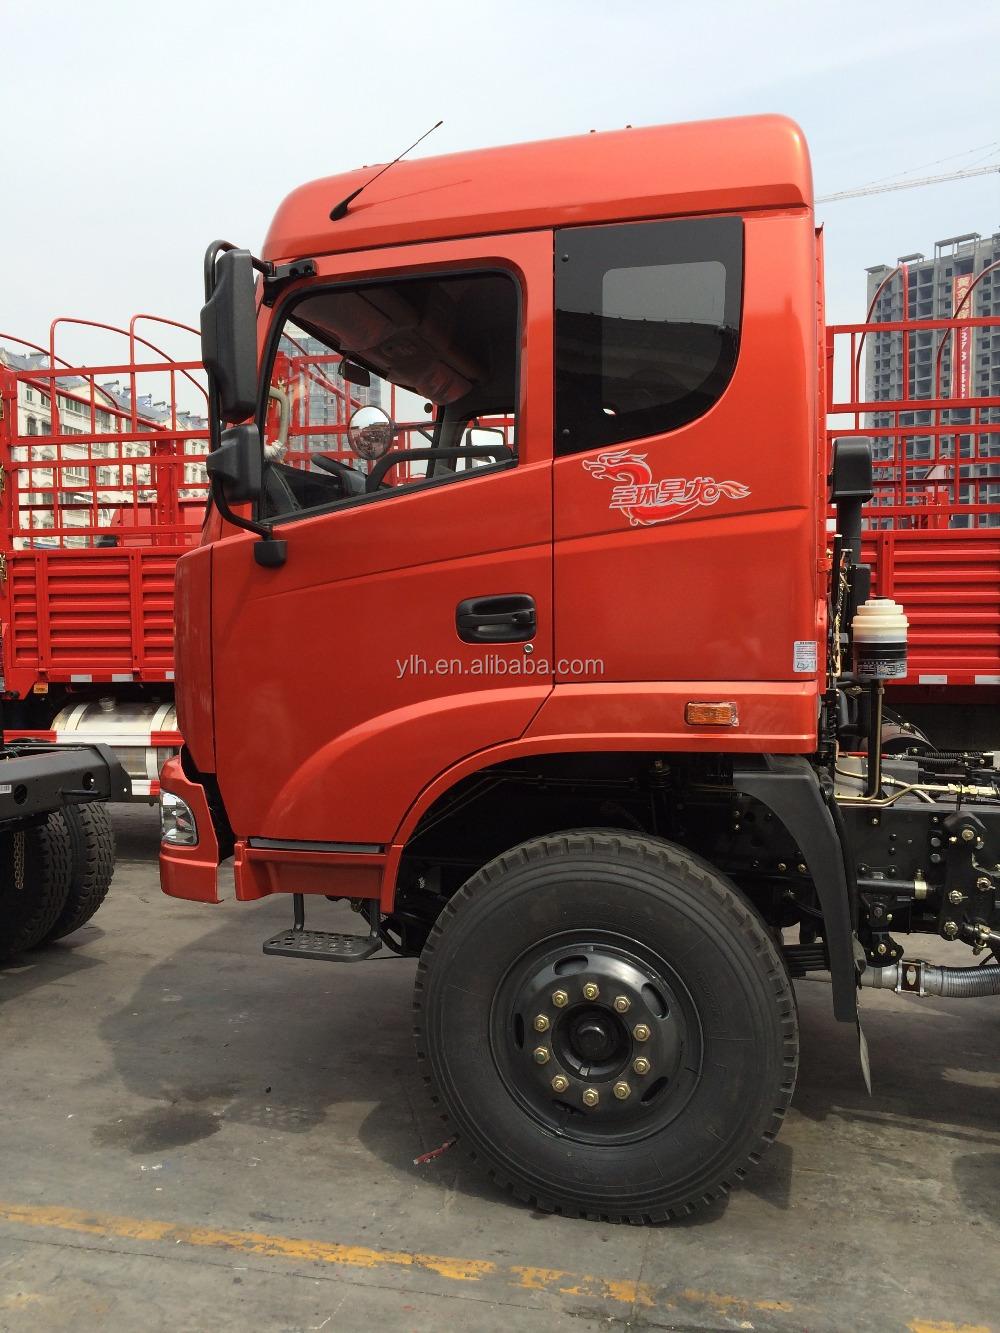 4x2 front loading capacity 12 ton sand carrier dump truck. Black Bedroom Furniture Sets. Home Design Ideas